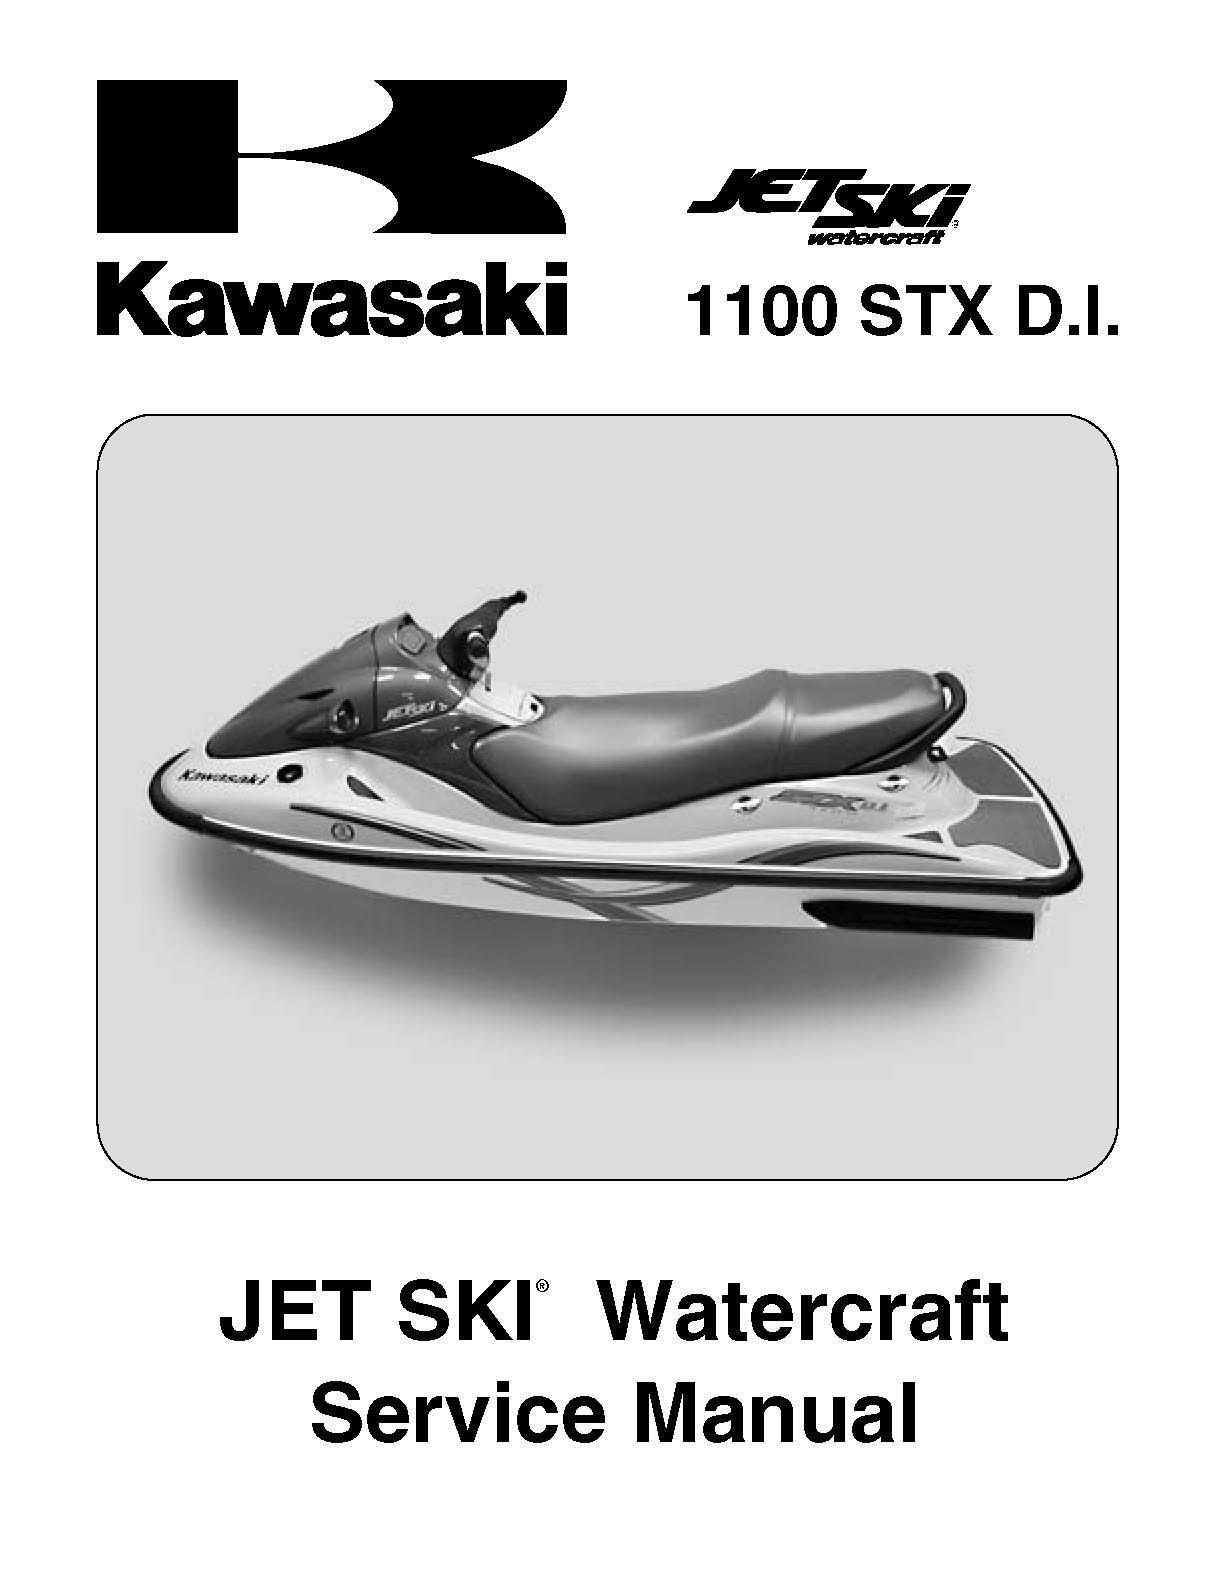 Kawasaki Stx Di Shop Manual